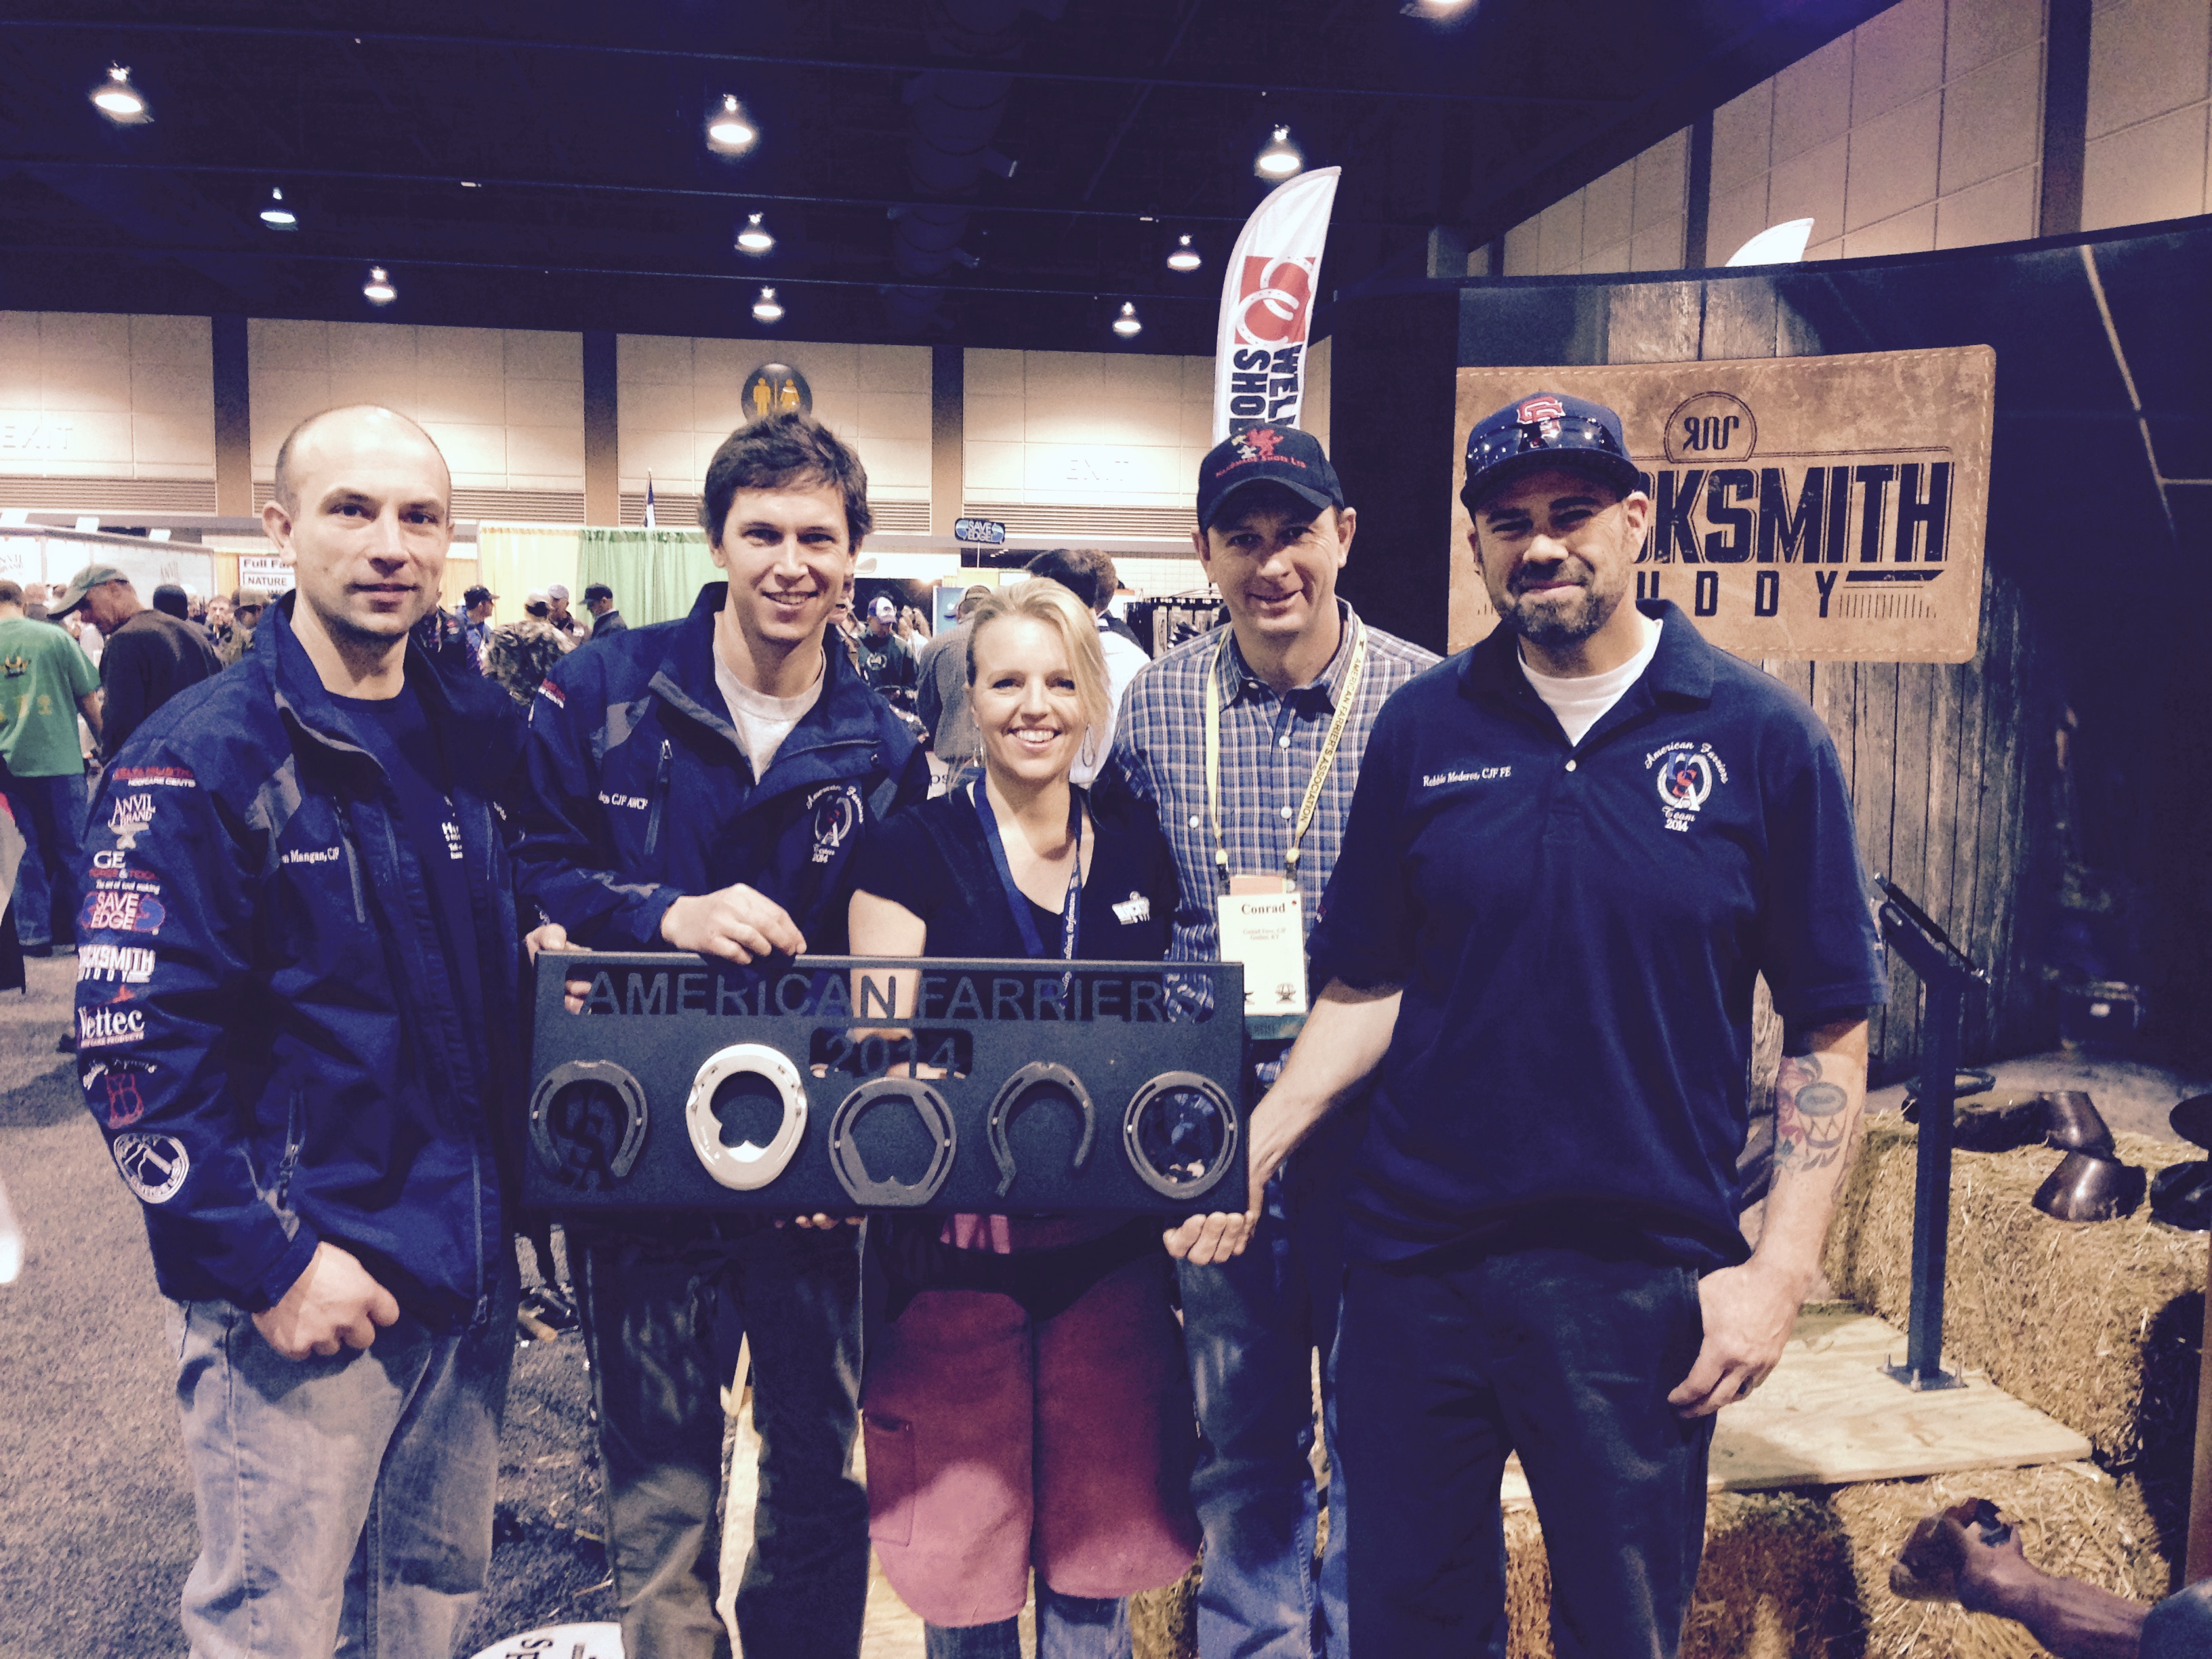 2014 American Farrier's Team with Blacksmith Buddy's Erin Baayen.